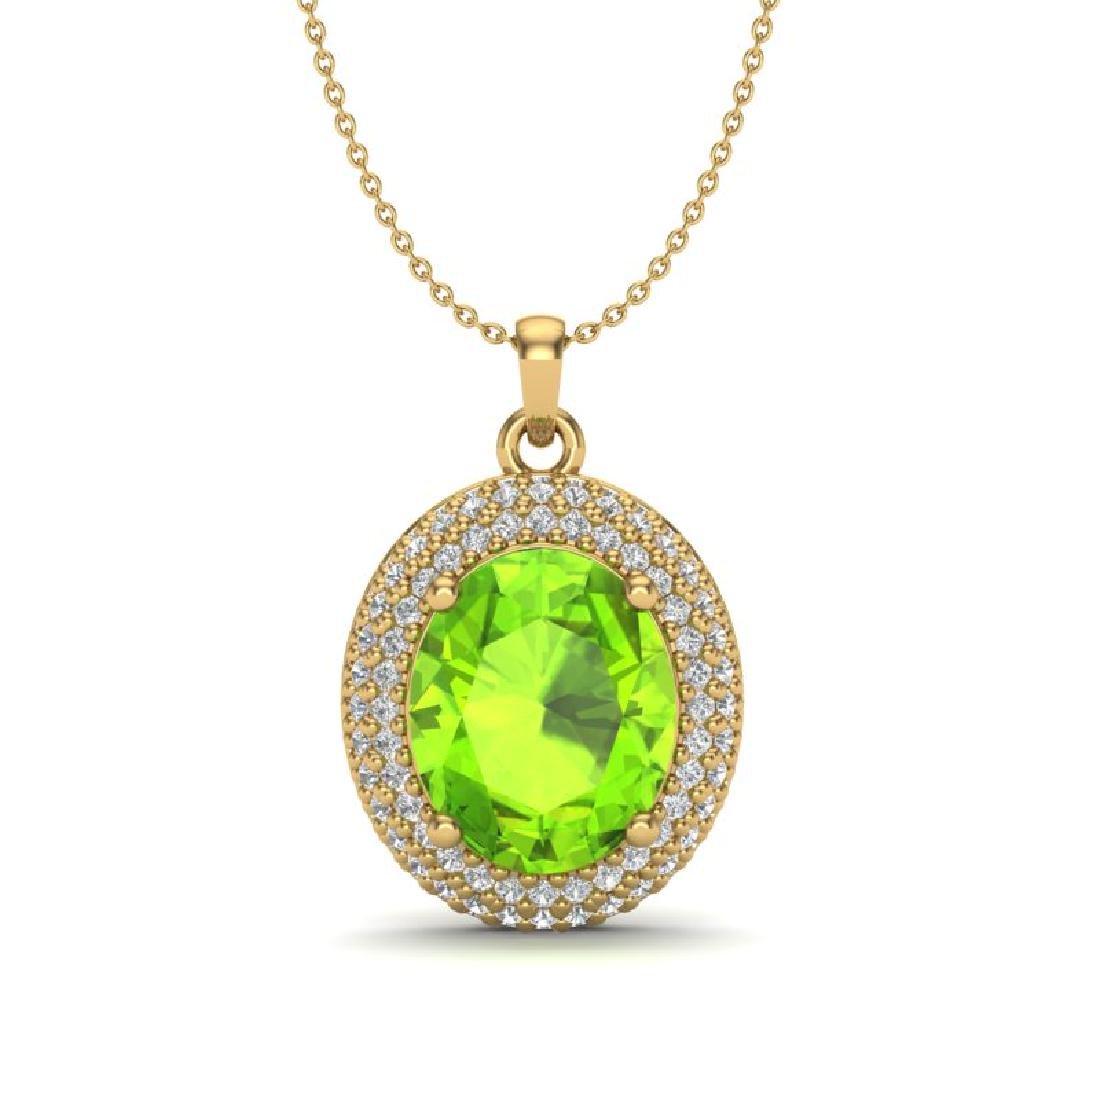 4.50 CTW Peridot & Micro Pave VS/SI Diamond Necklace